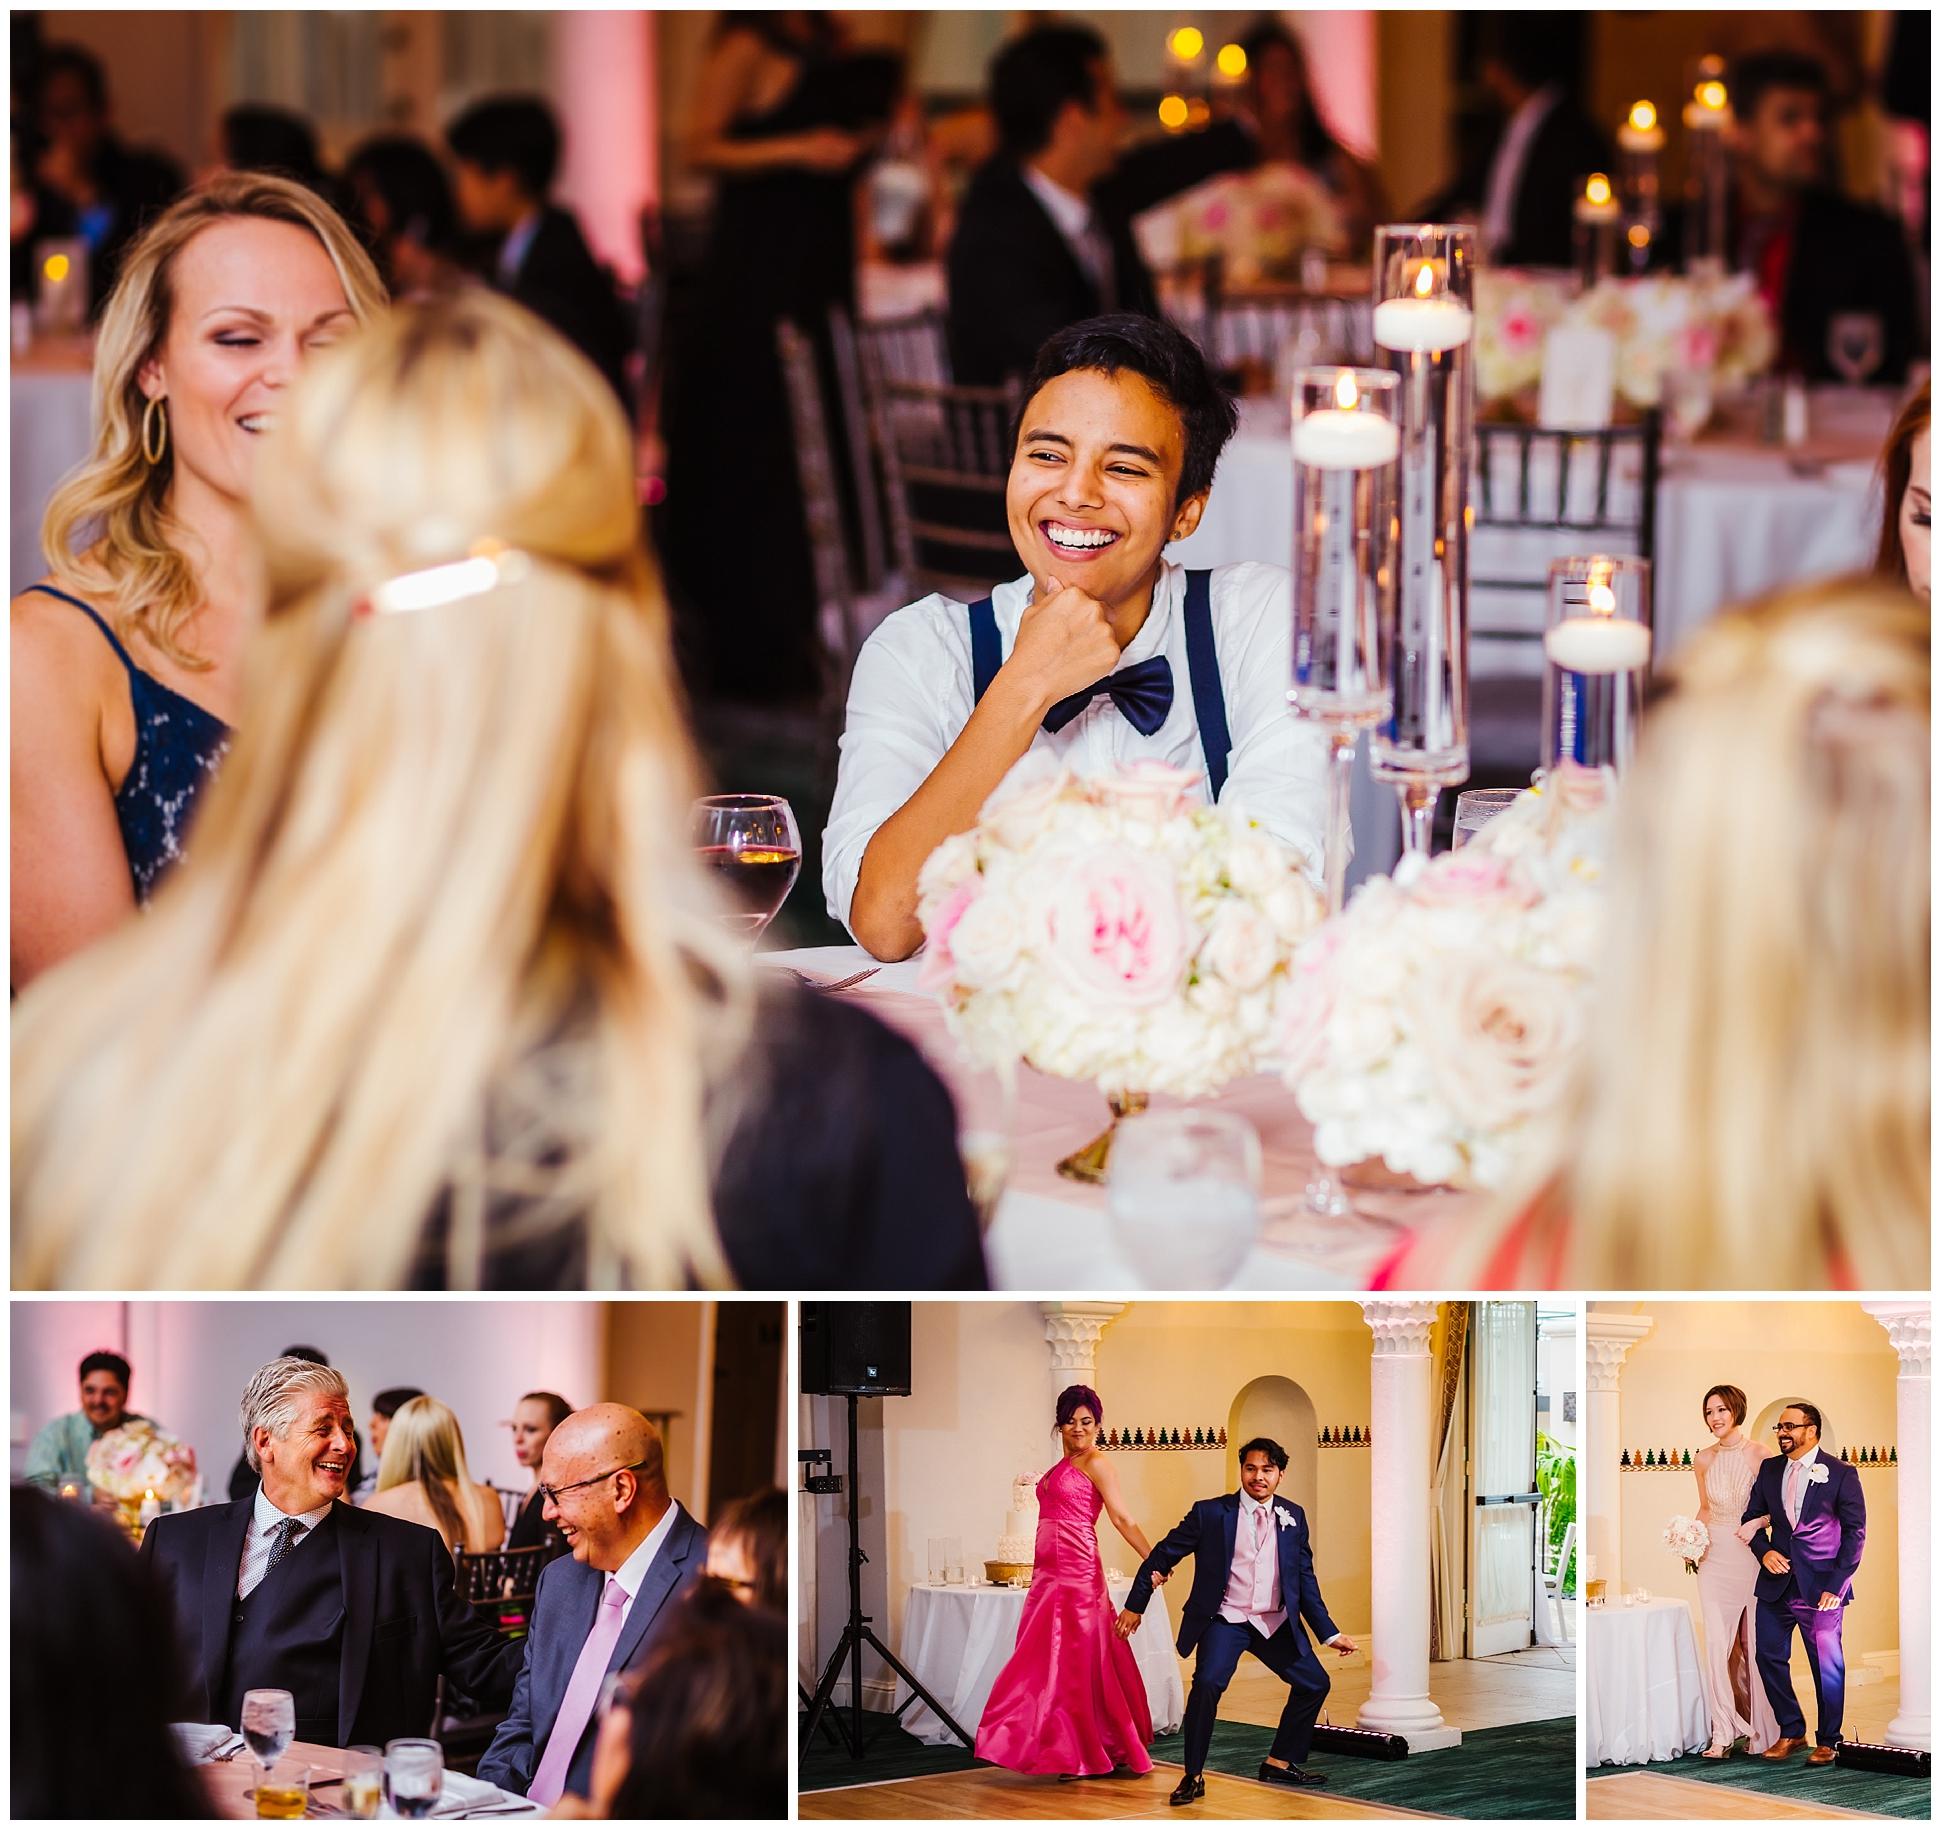 vinoy-sunset-ballroom-rainy-day-wedding-photography-orchids-trinidad-flawless-fetes-ashlee-hamon_0147.jpg